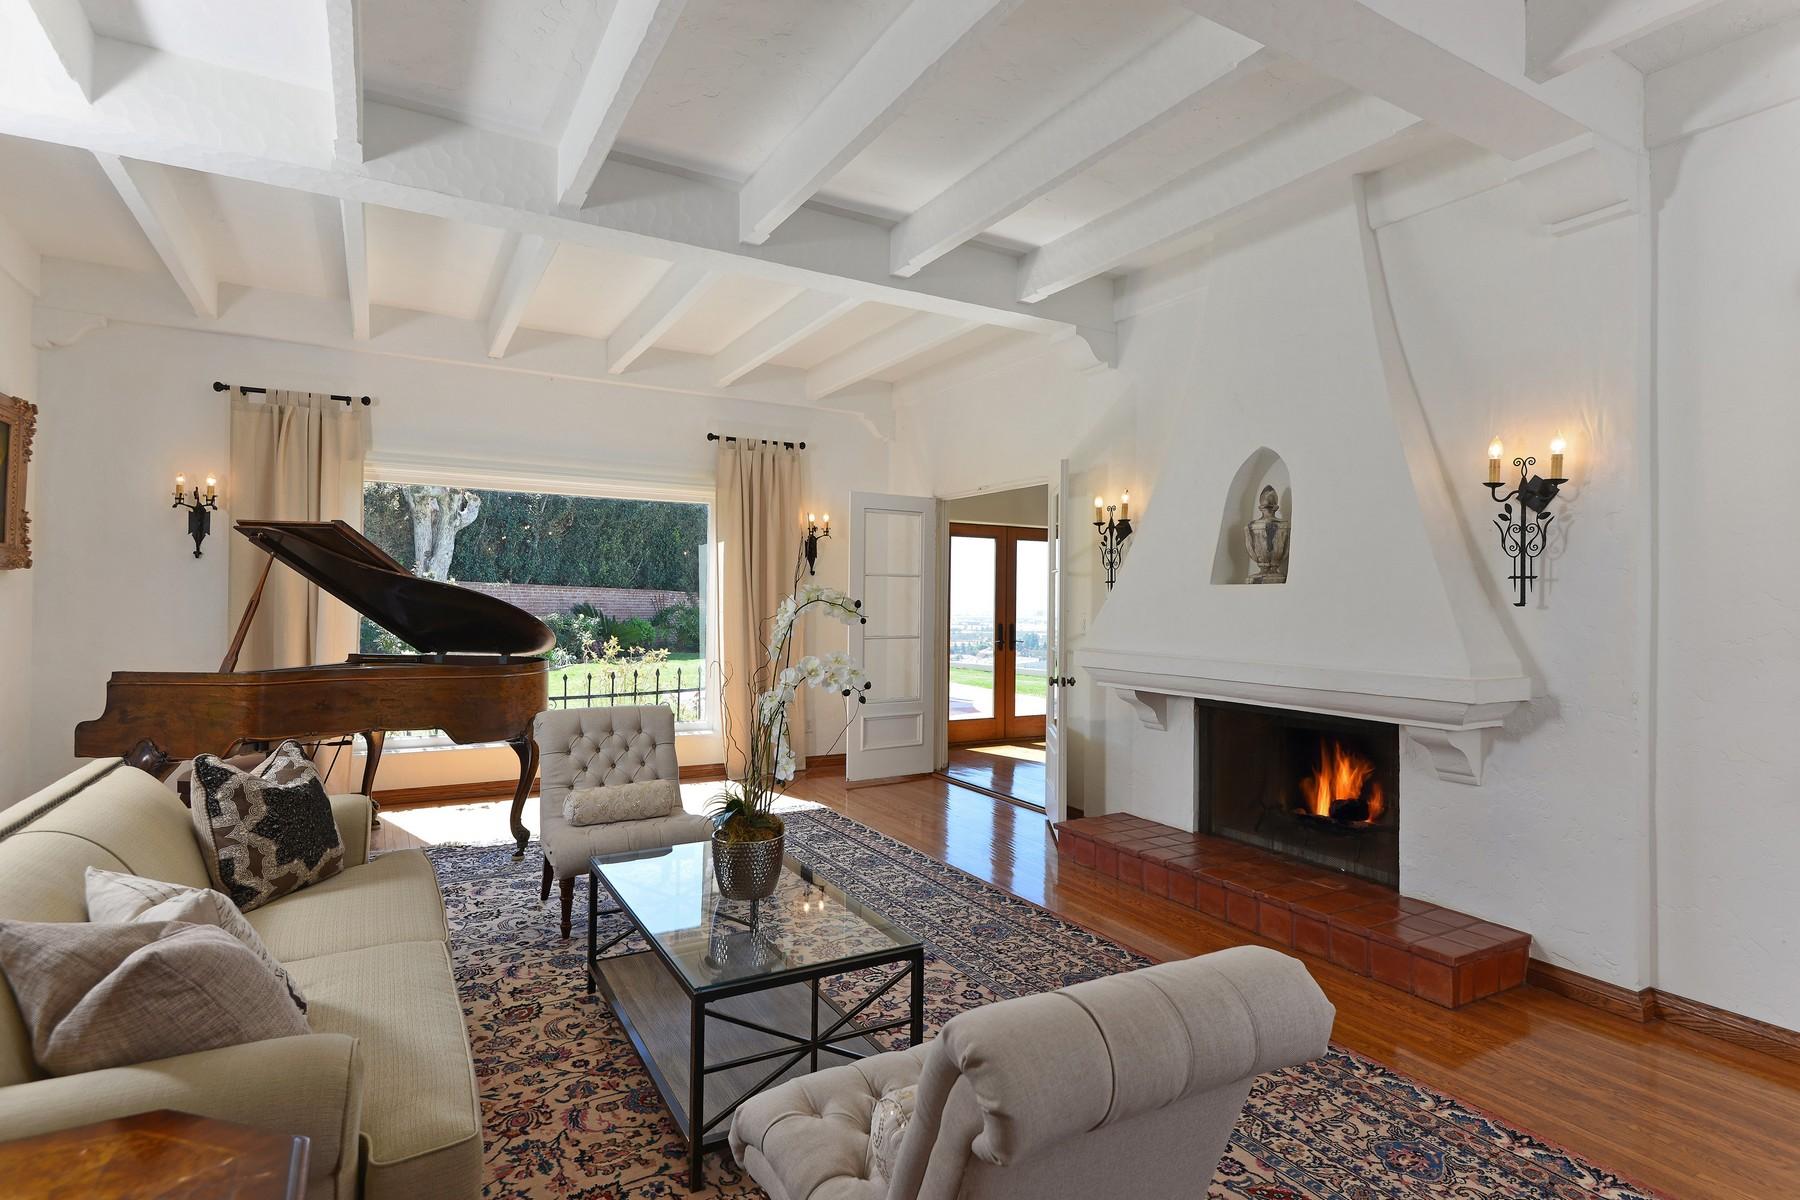 Additional photo for property listing at 2335 Juan  圣地亚哥, 加利福尼亚州 92103 美国